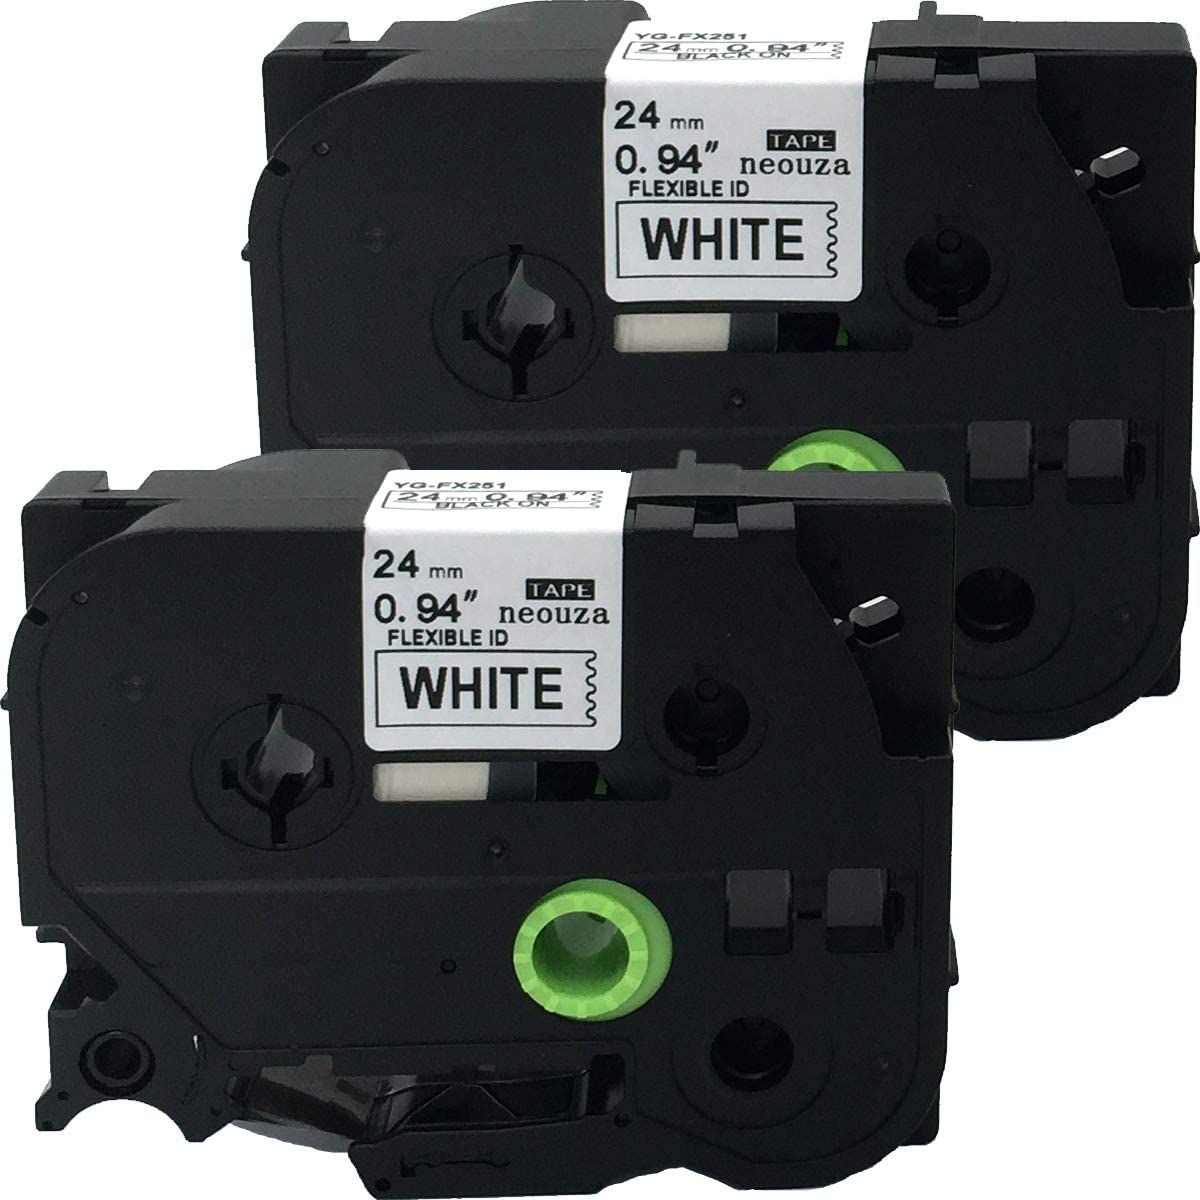 TZe-B51 Black on Orange Fluorescent NEOUZA 2PK Compatible For Brother P-Touch Laminated TZe TZ Label Tape 24mm x 5m